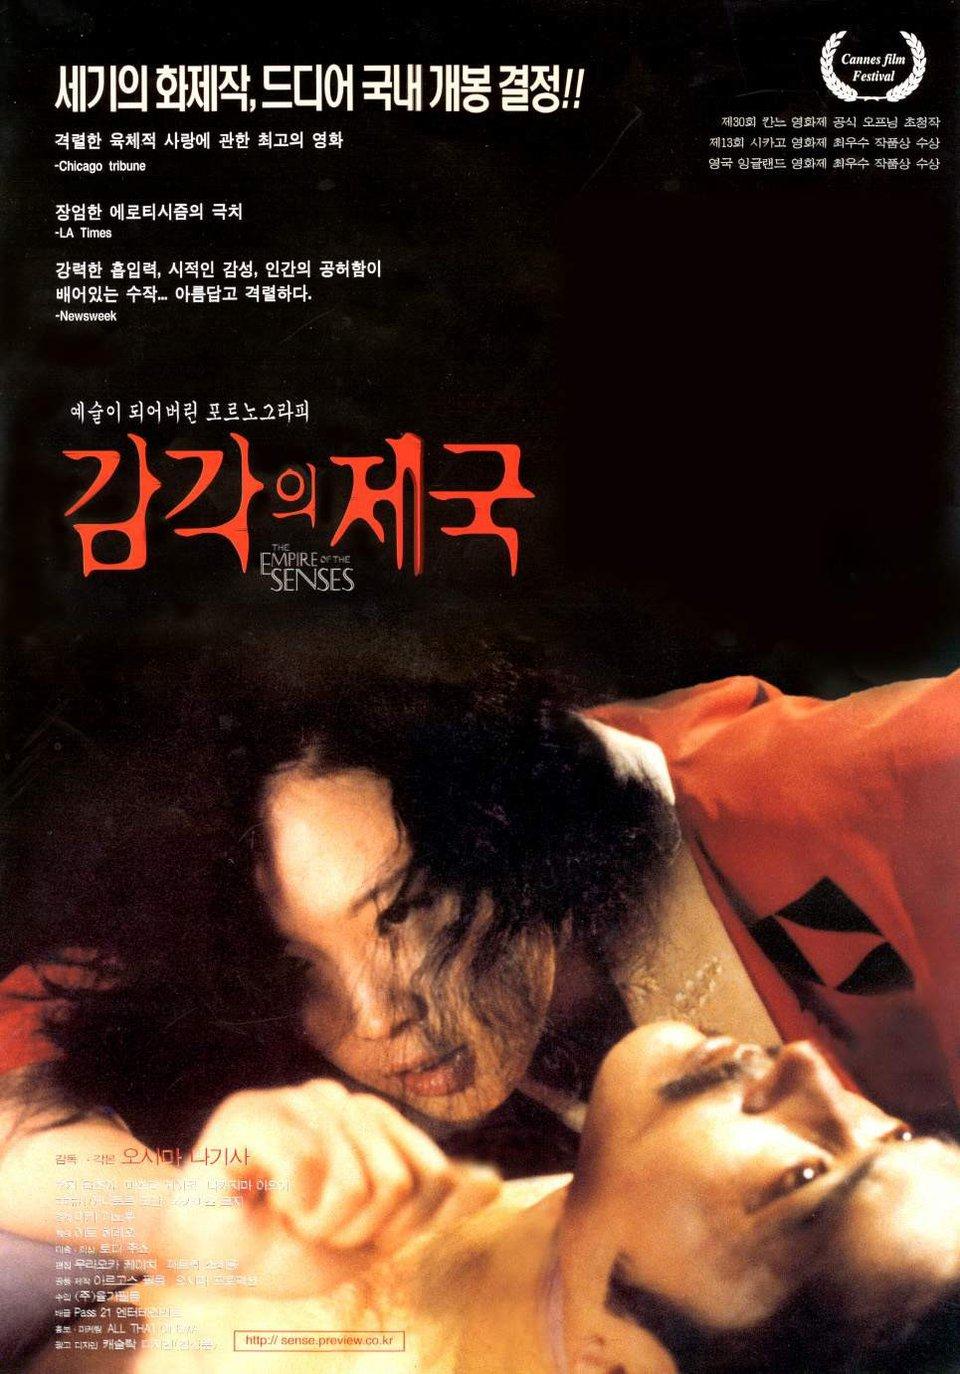 """Империя чувств"", Япония, 1976, Oshima Productions, Shibata Organization, режиссёр и автор сценария Нагиса Осима, композитор Минору Мики"